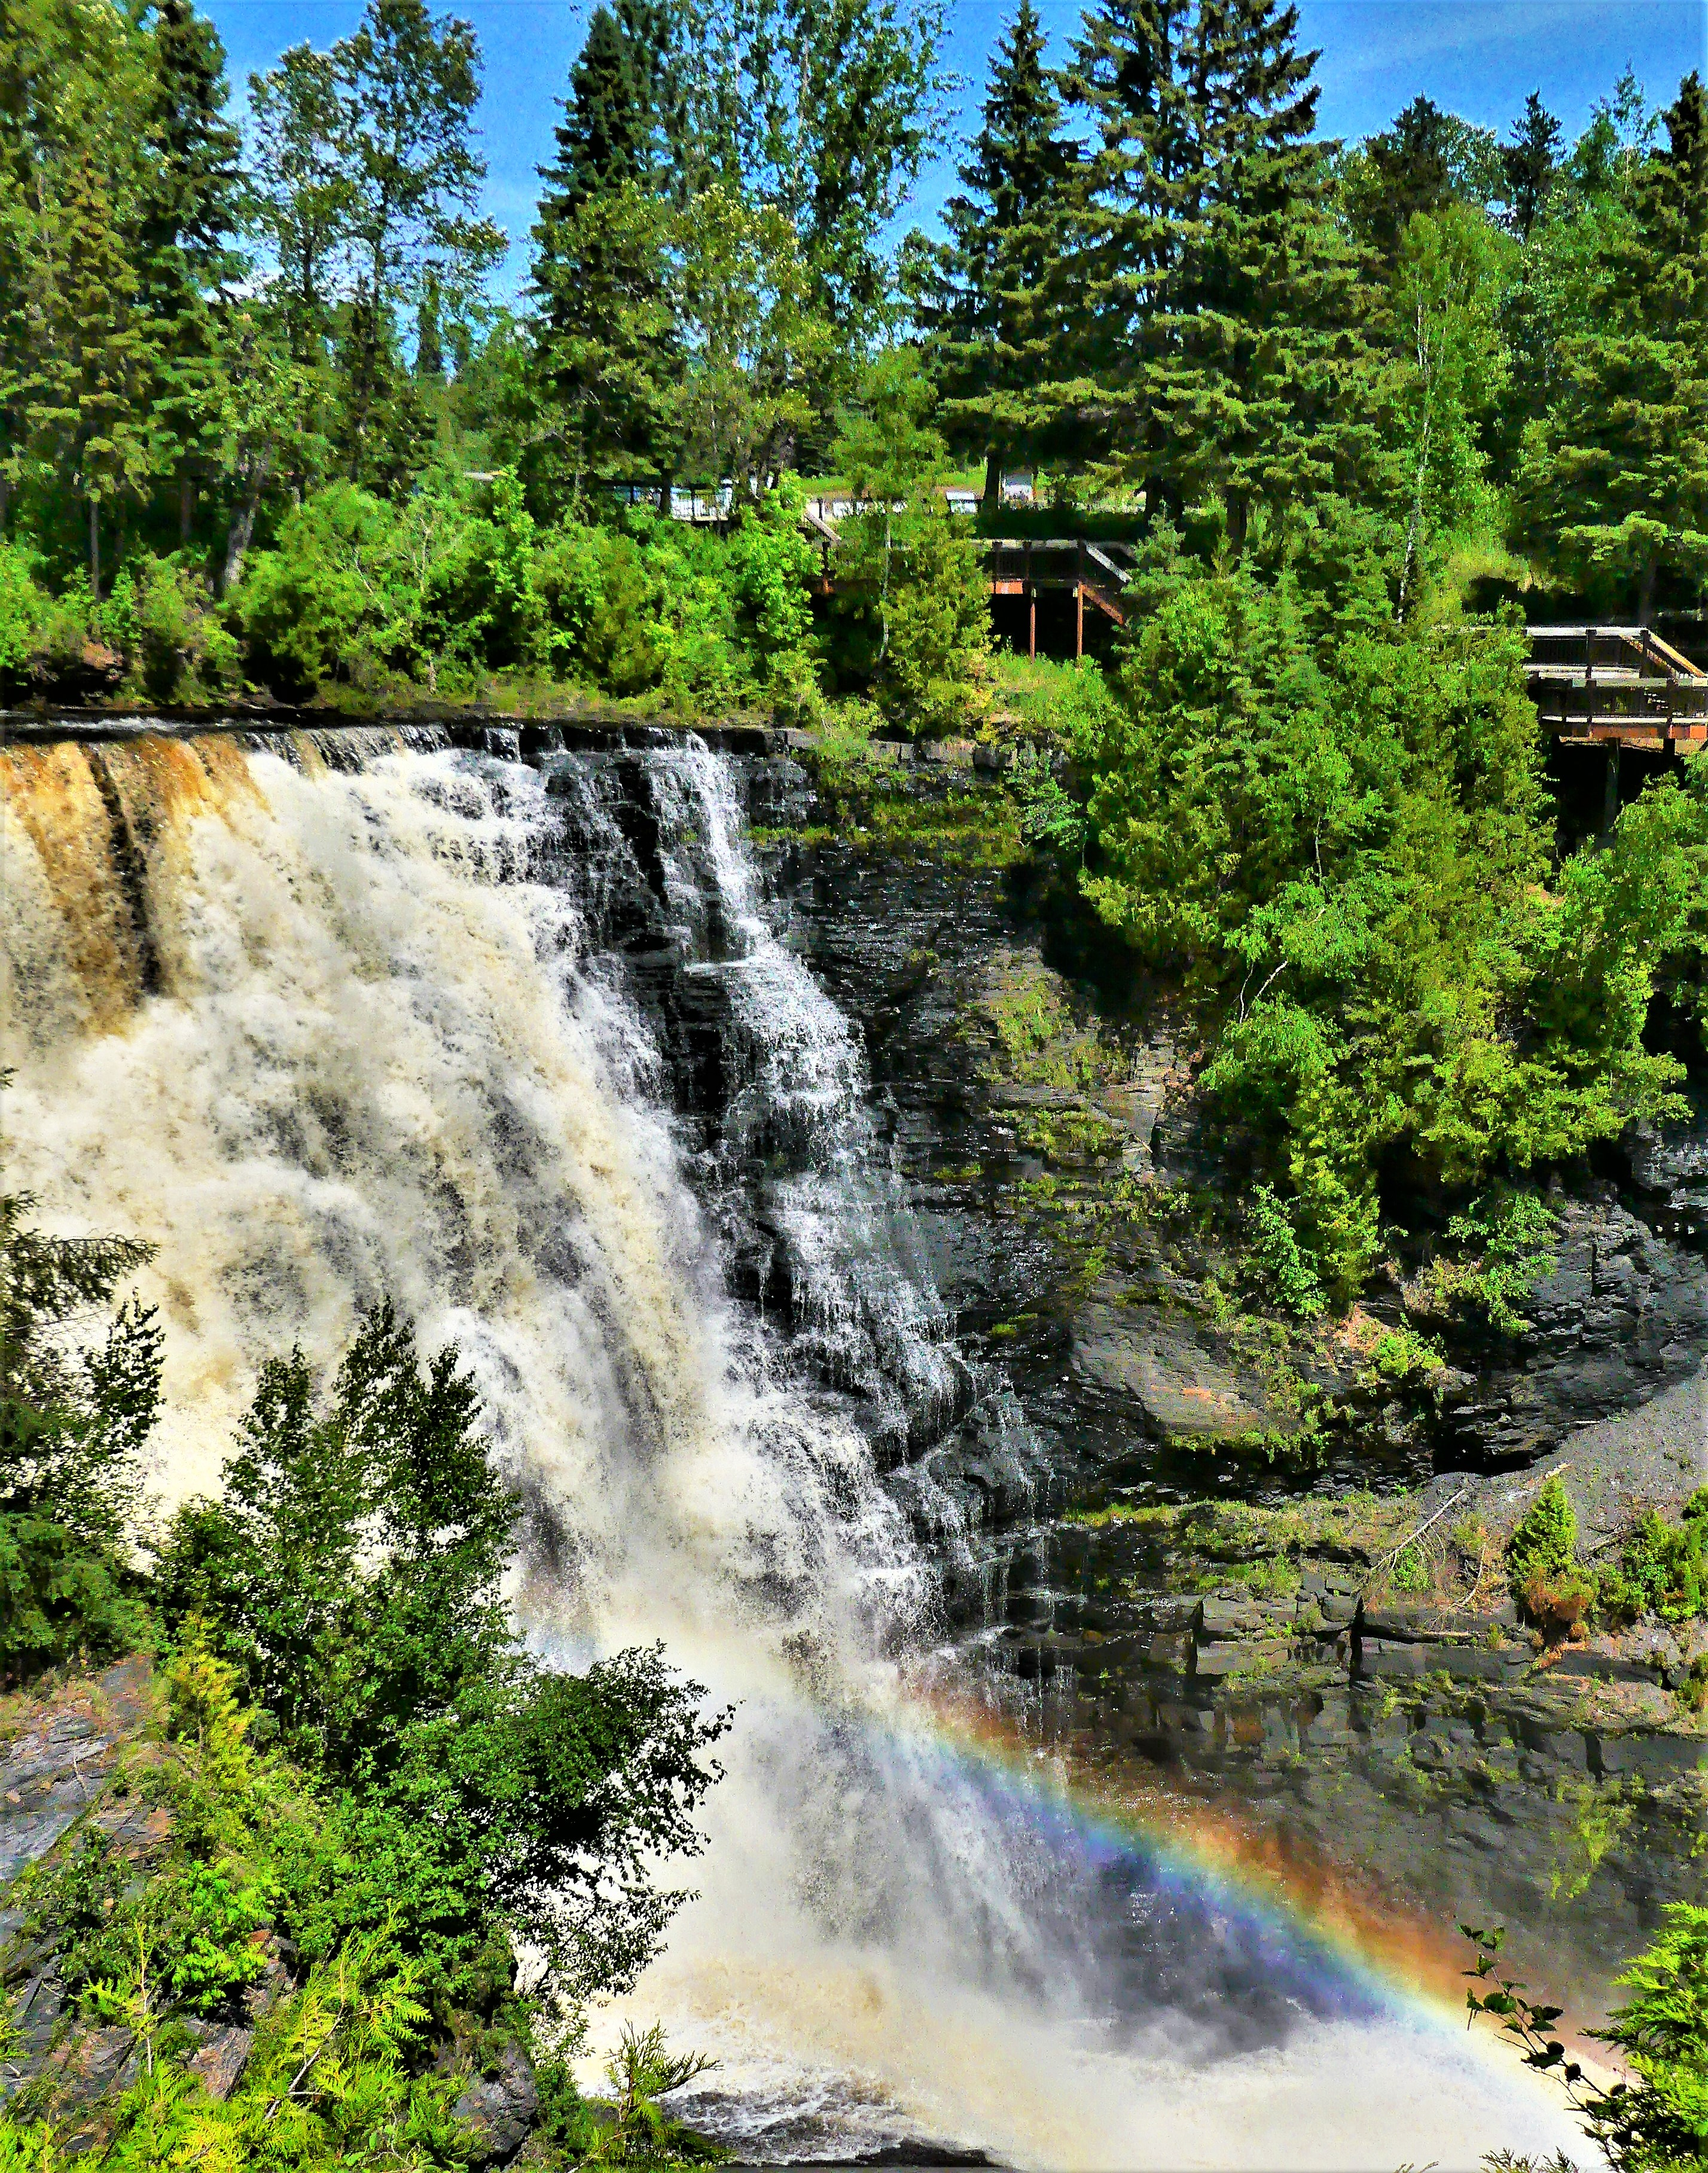 Kakabeka Falls with rainbow